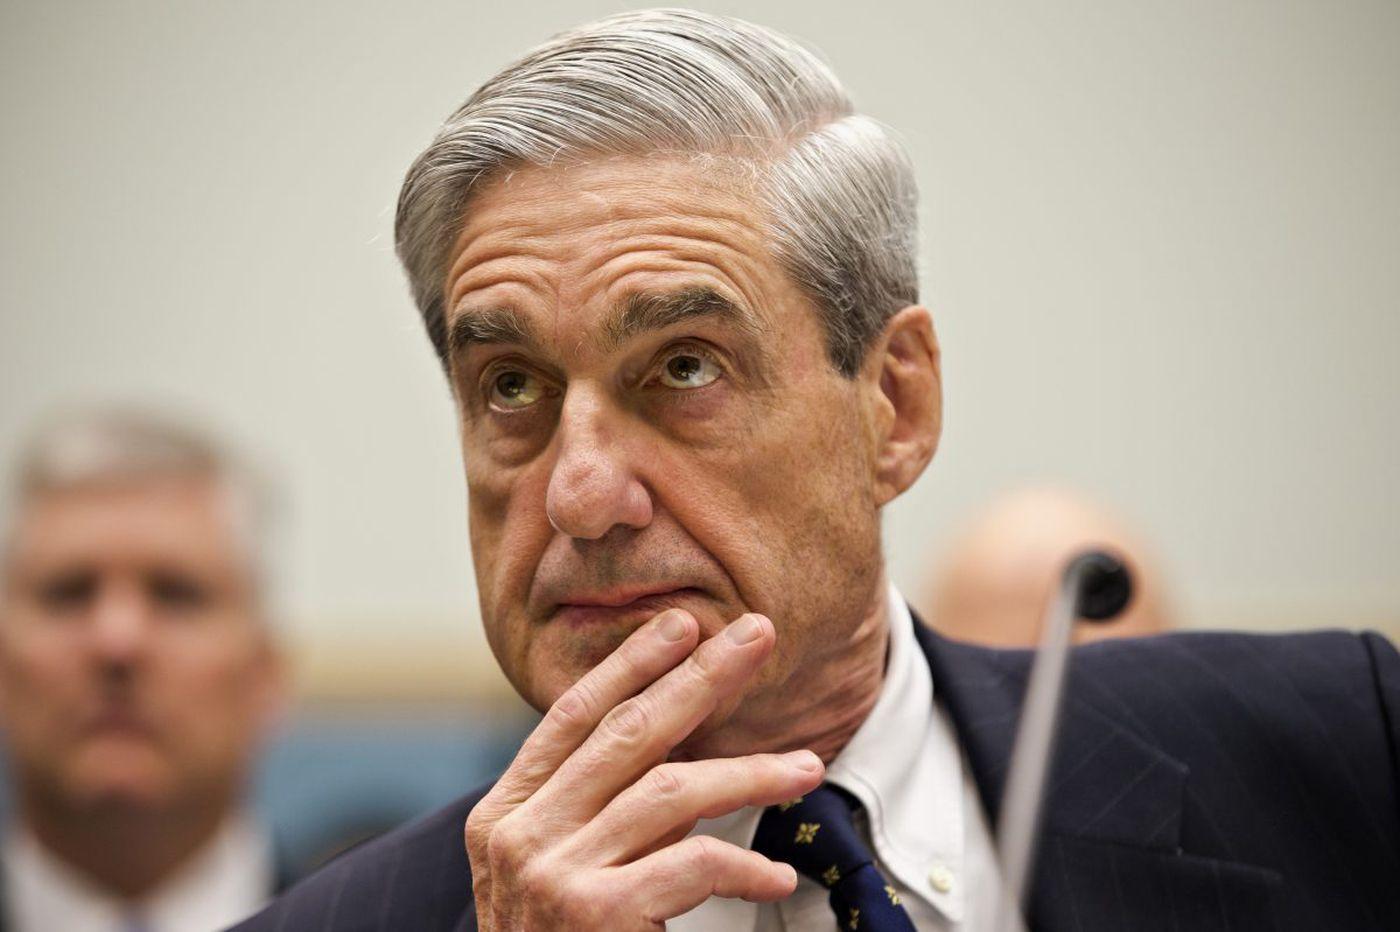 Trump Deutsche Bank records said to be subpoenaed by Mueller